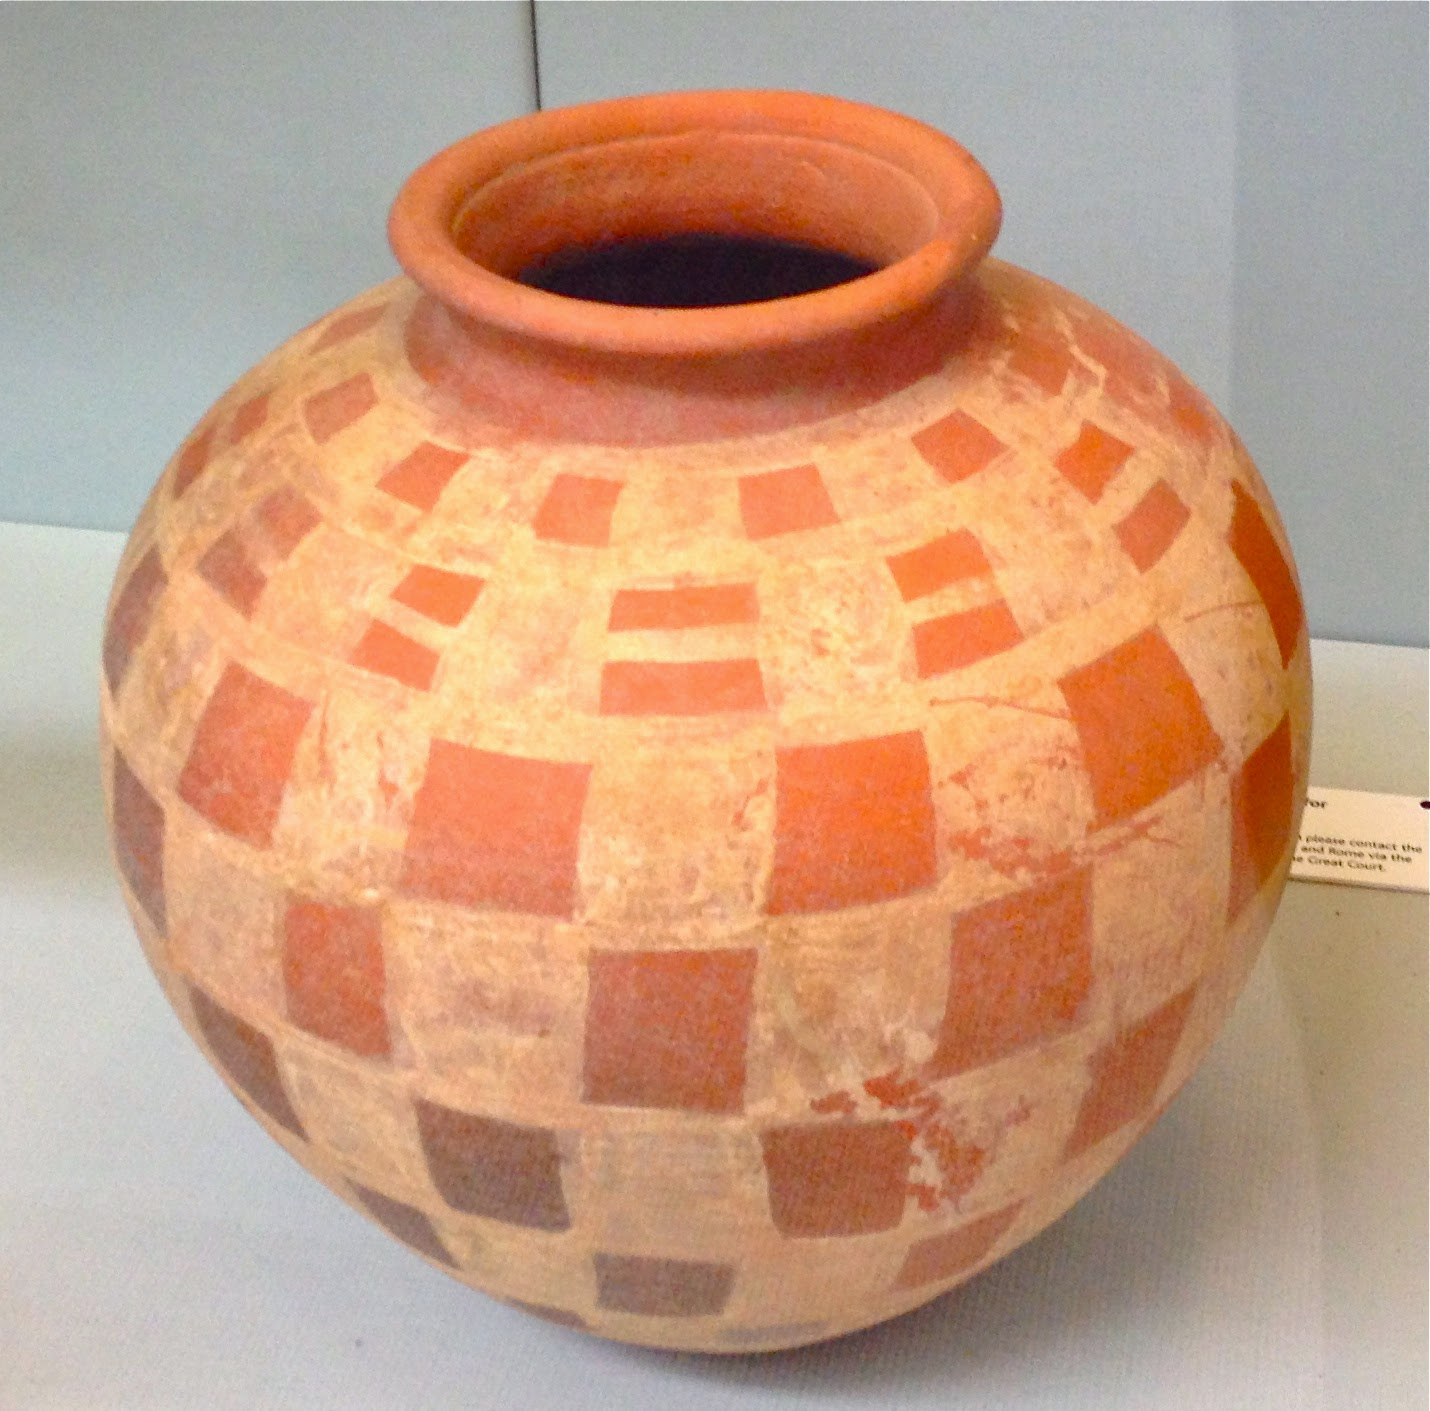 Two Heads . . .: Ancient Pueblan Vs Ancient Greek Pots